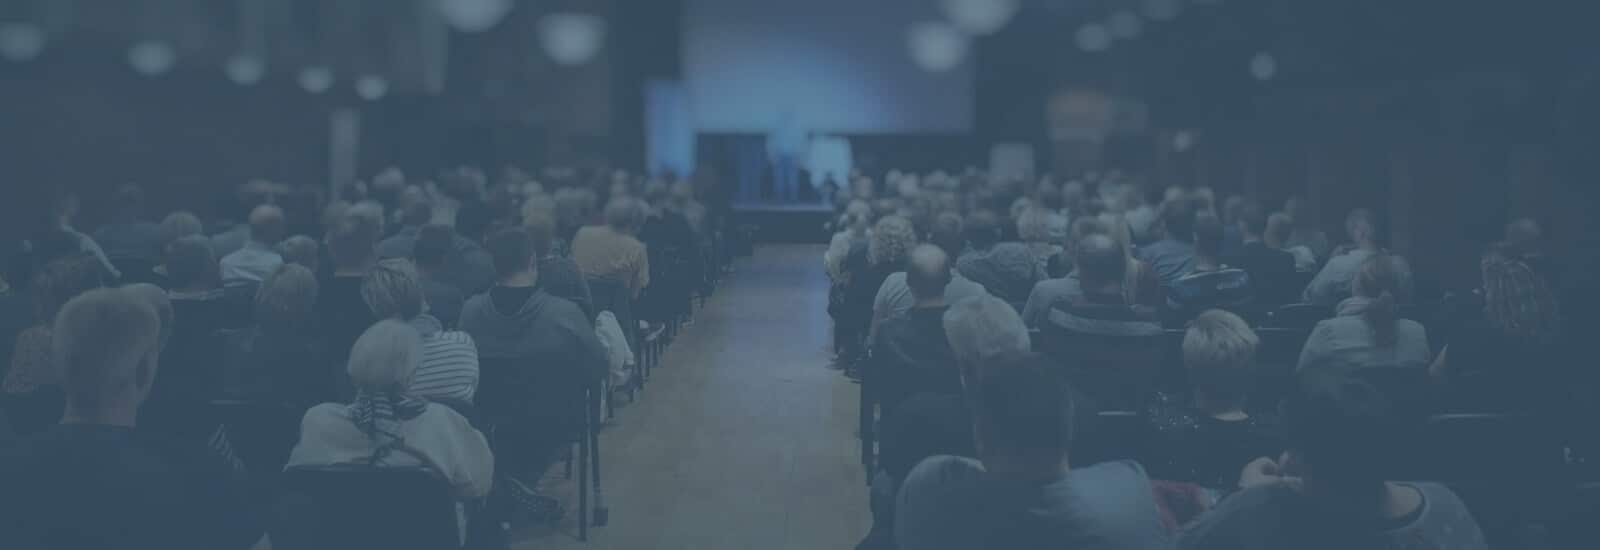 Speaker Mel Robbins | Influential Motivator | Book a keynote